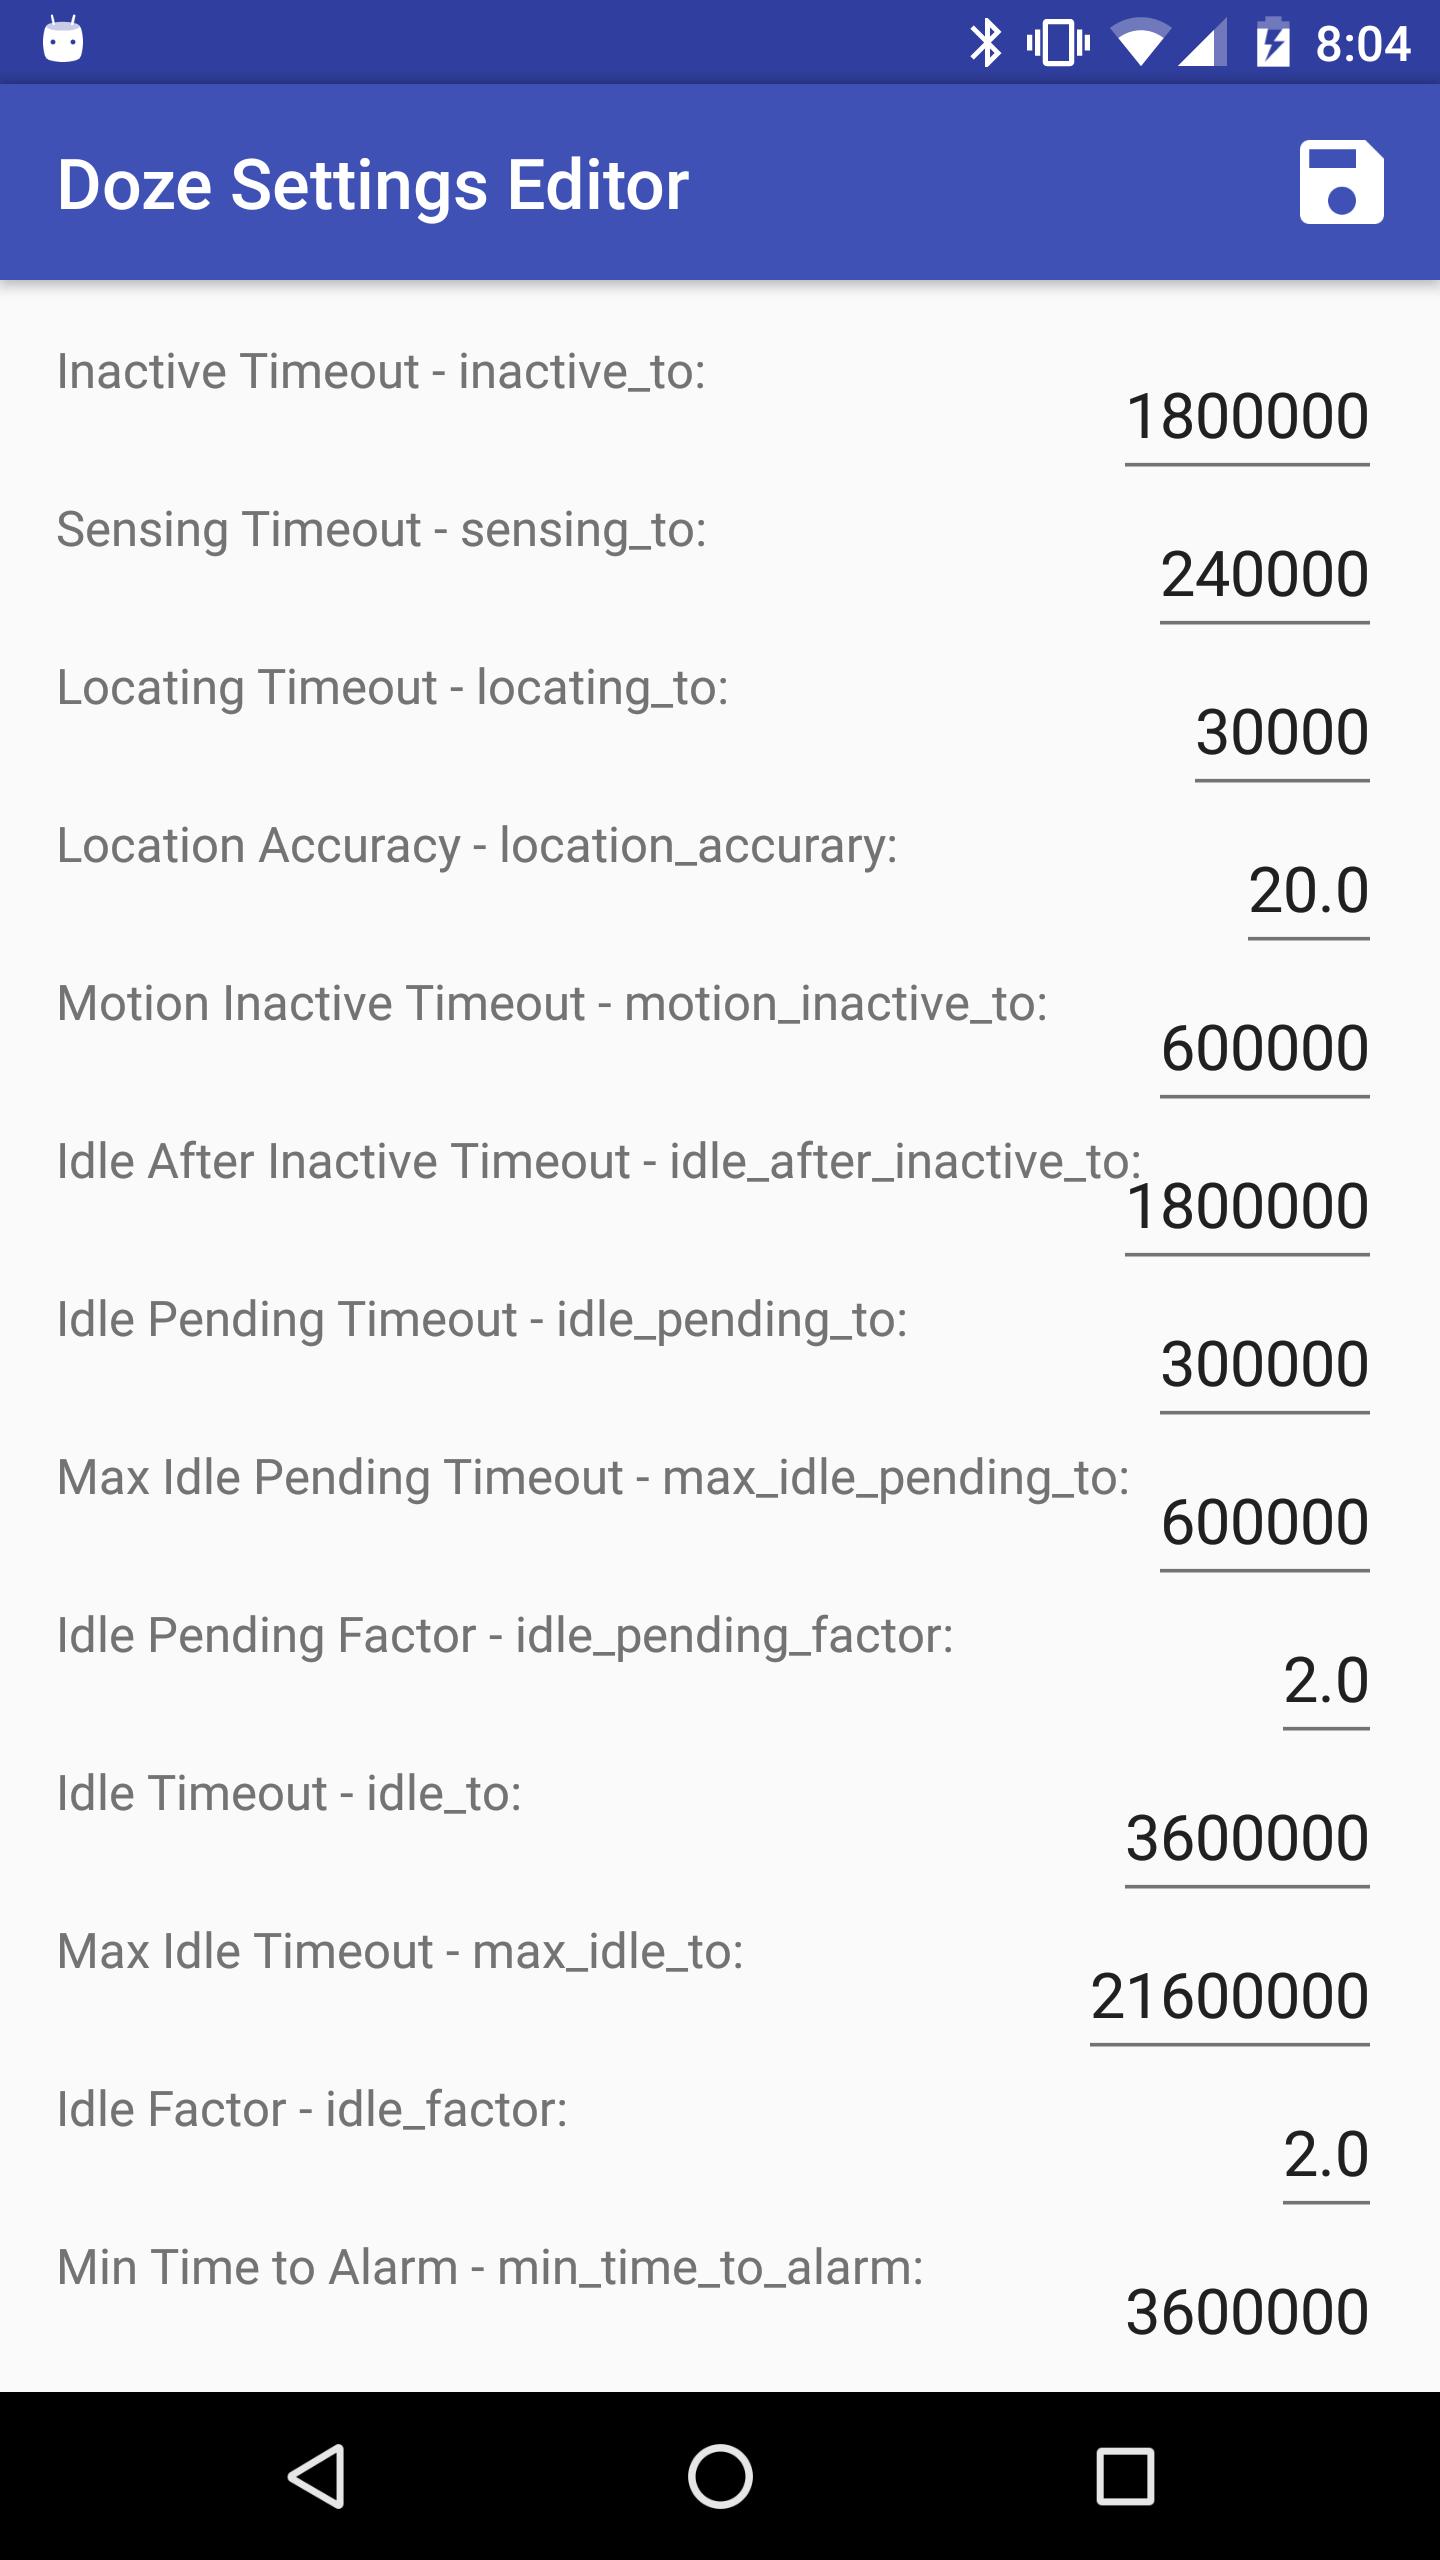 Doze Settings Editor app_1